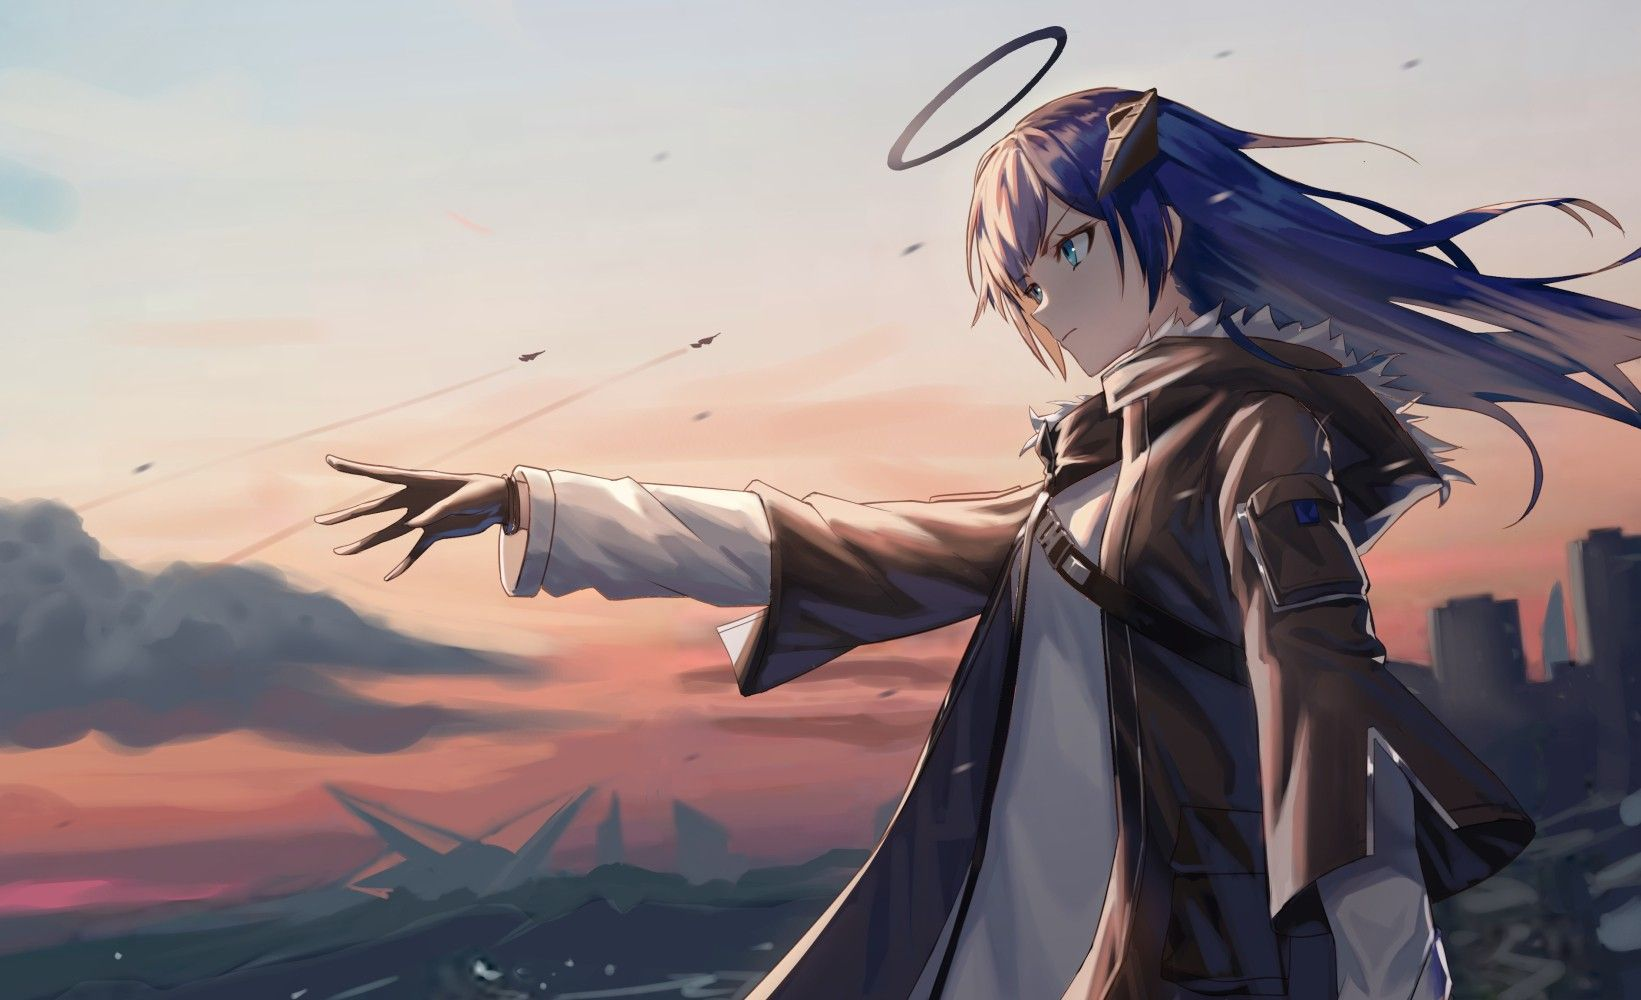 Pin oleh strayblackwolf di アニメゲーム di 2020 Seni anime